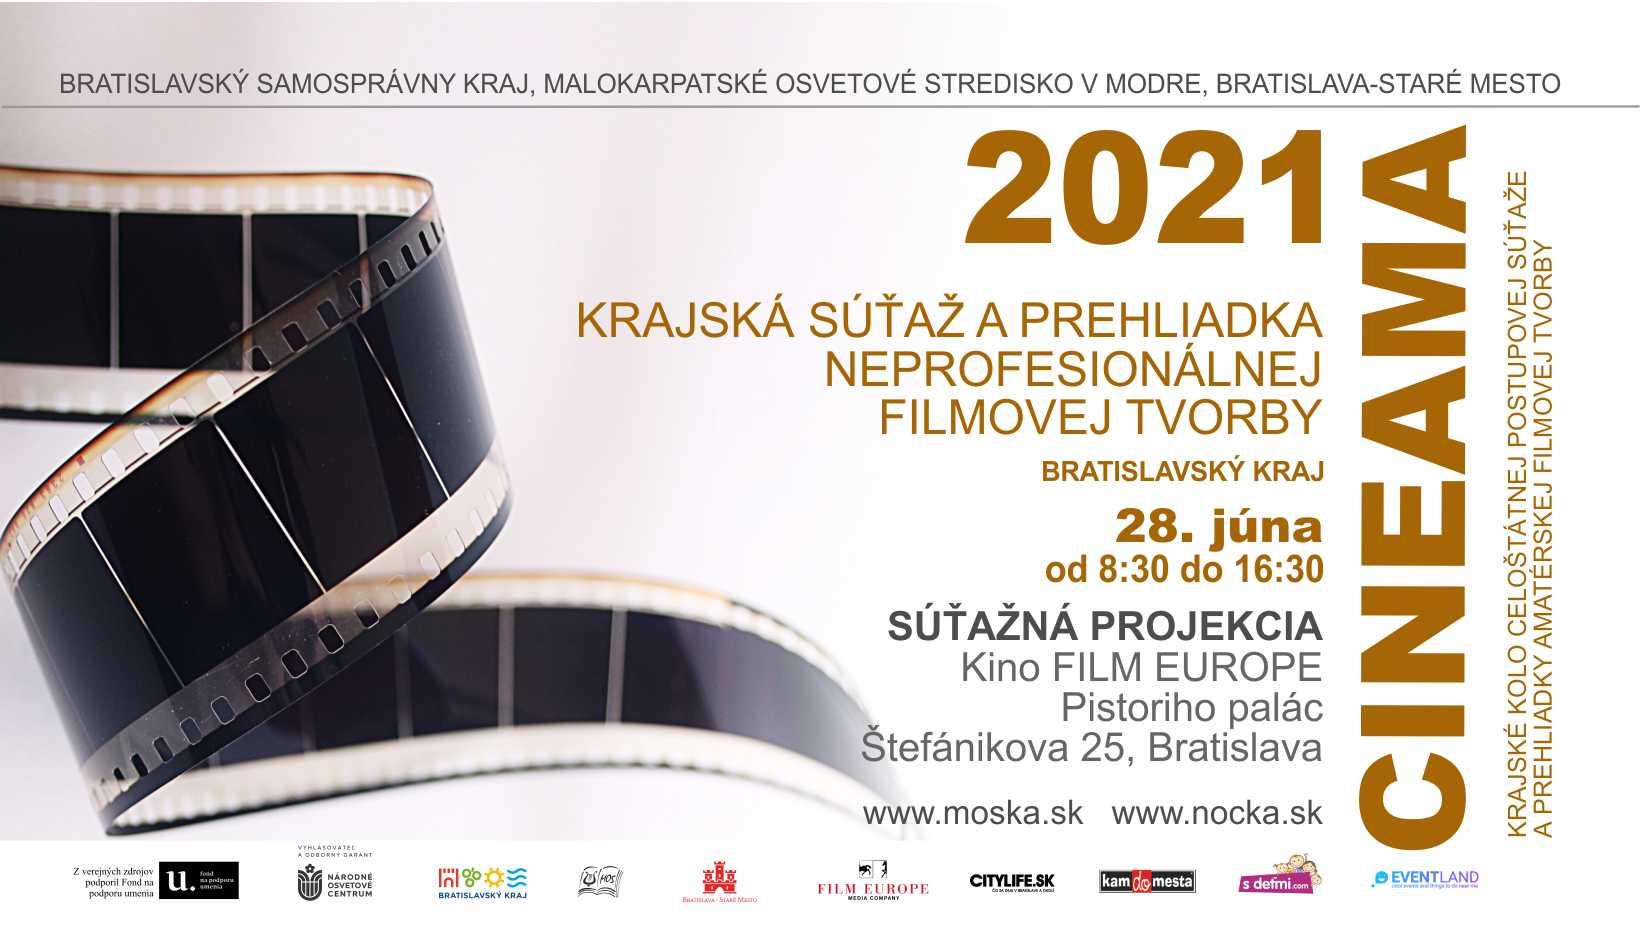 CINEAMA 2021 - 28.6.2021 od 8:30 do 16:30, kinosála Film Europe - Pistoriho palác, Bratislava